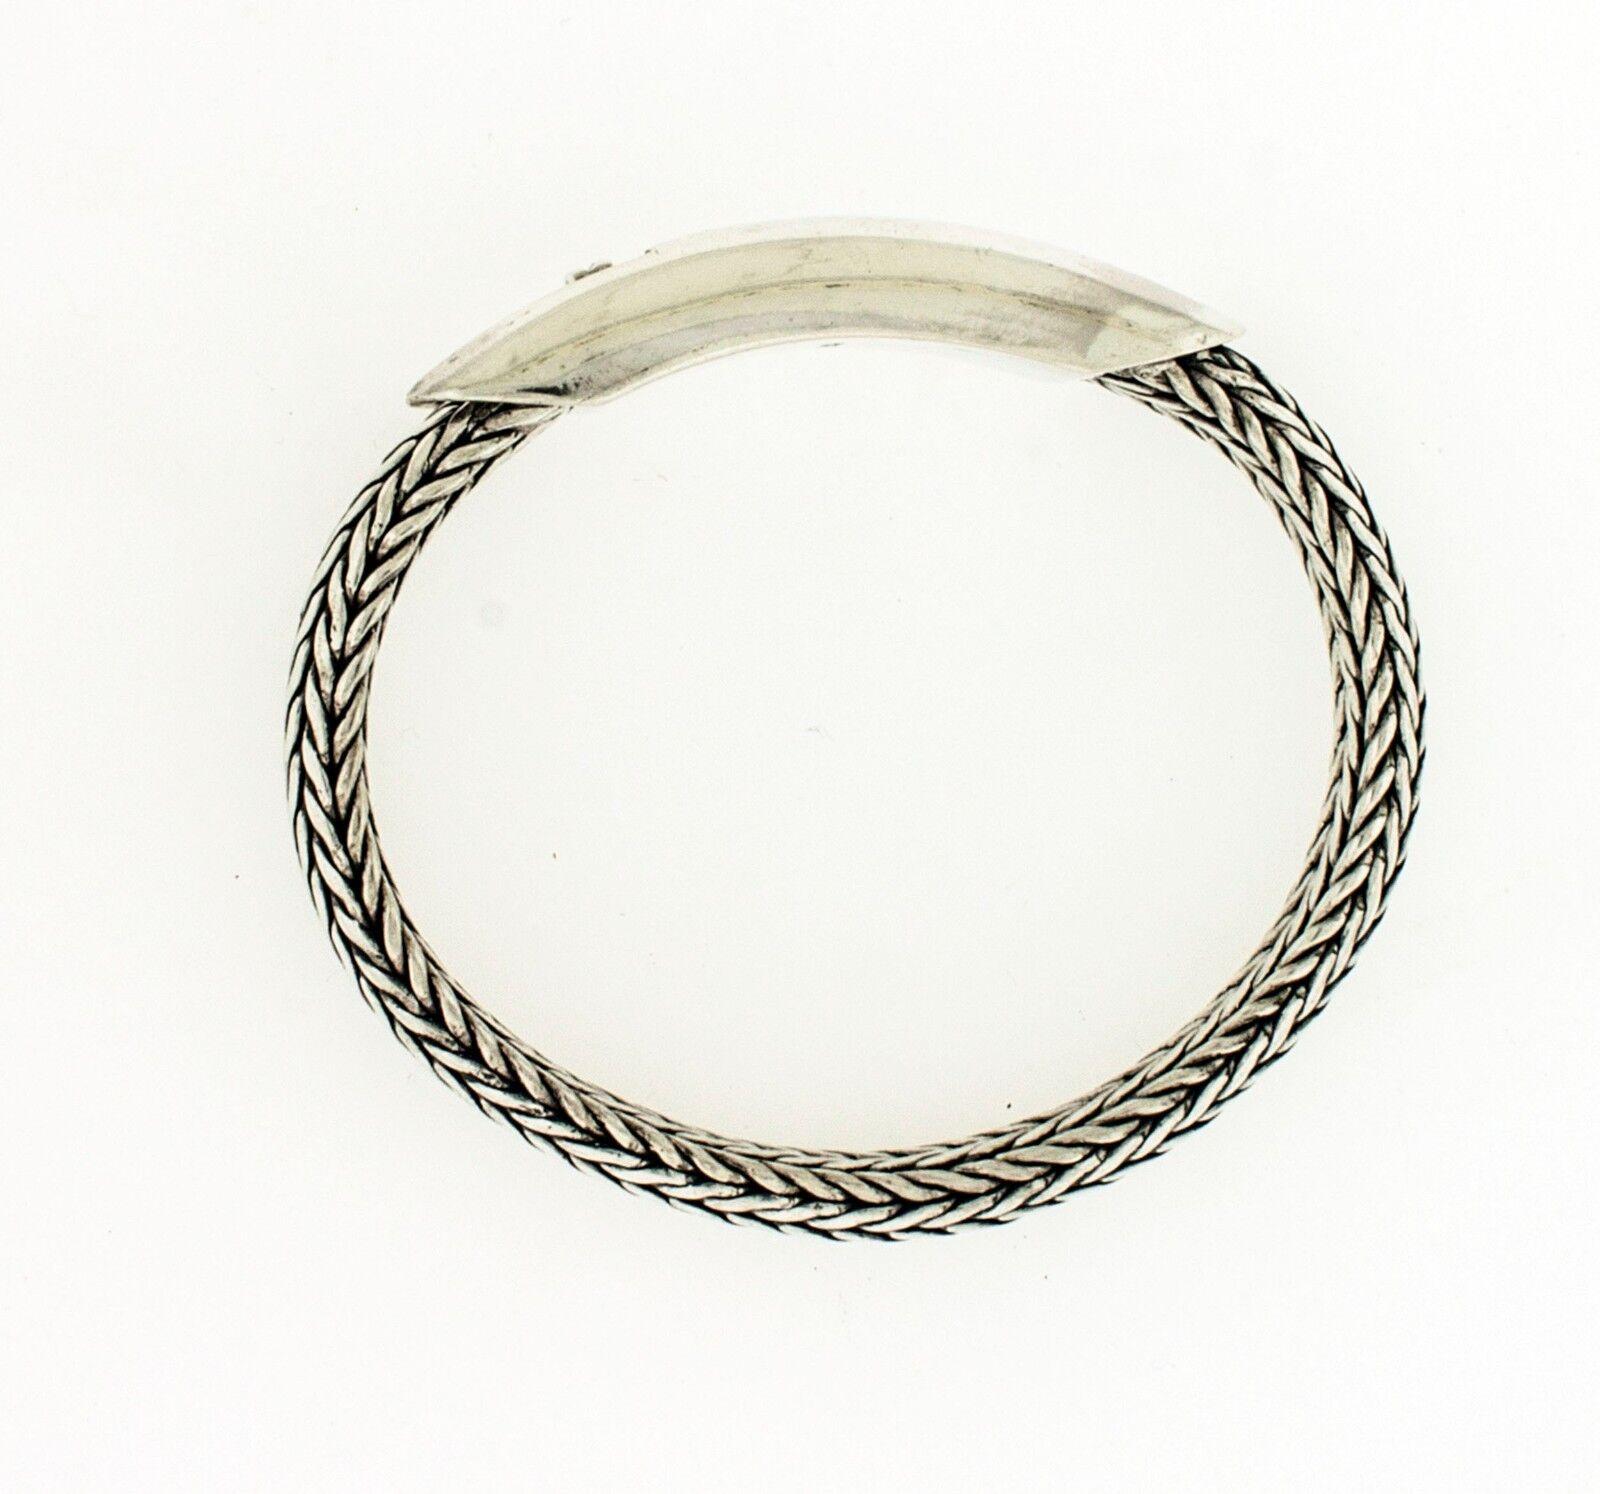 Nuovo argentoo 925 925 925 Ondulata Frumento Corda Serpente Bali neroened 20.3cm 95aab8